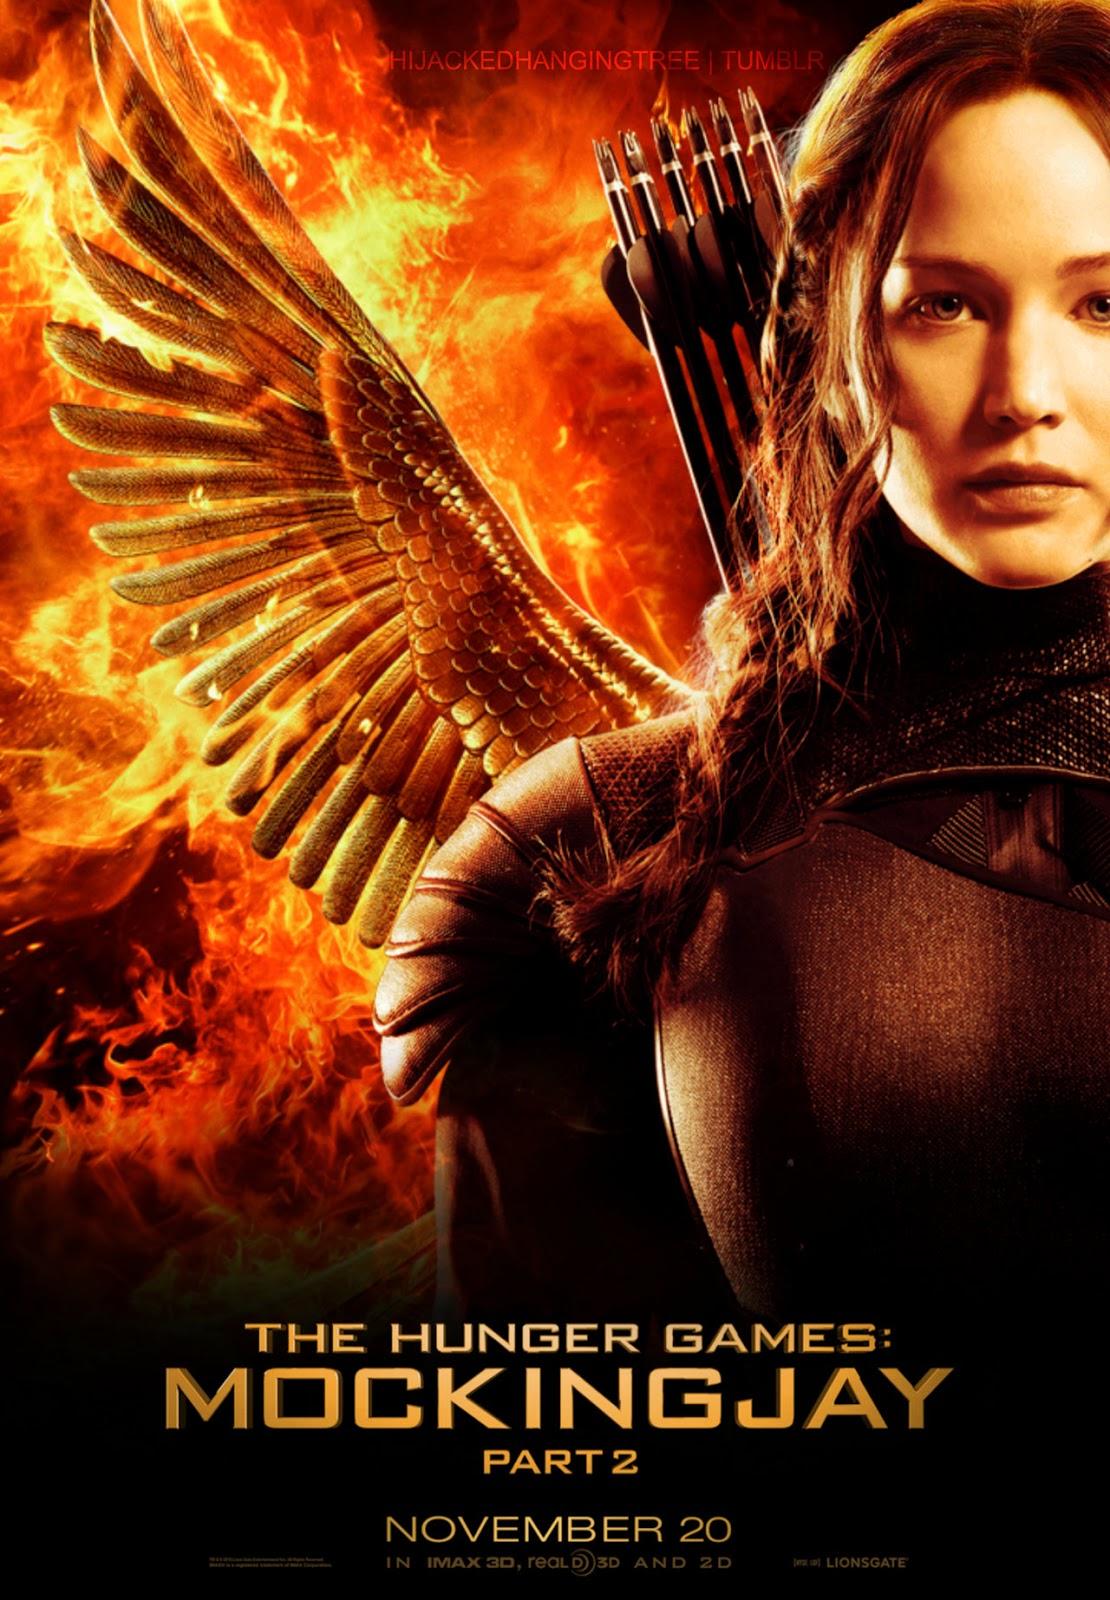 The Hunger Games: Mockingjay - Part 2 (2015) - IMDb